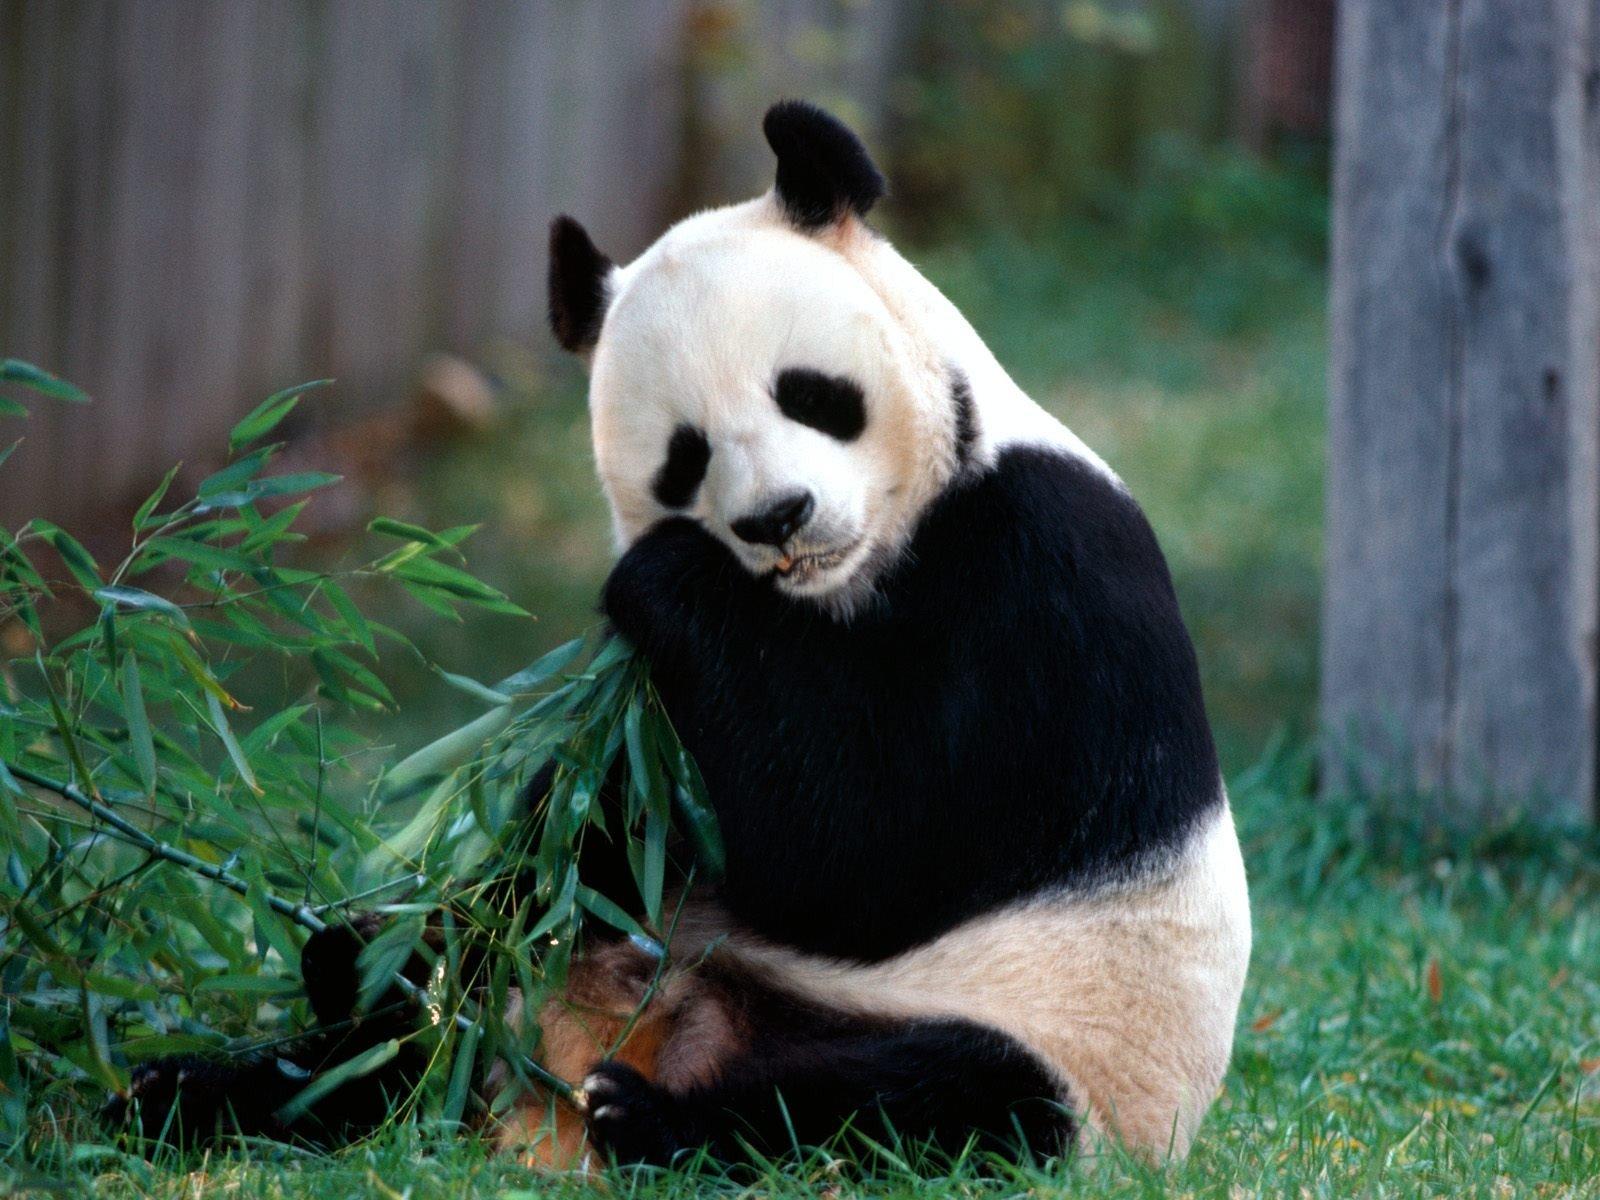 download wallpaper panda bear hd animals | downloadfy